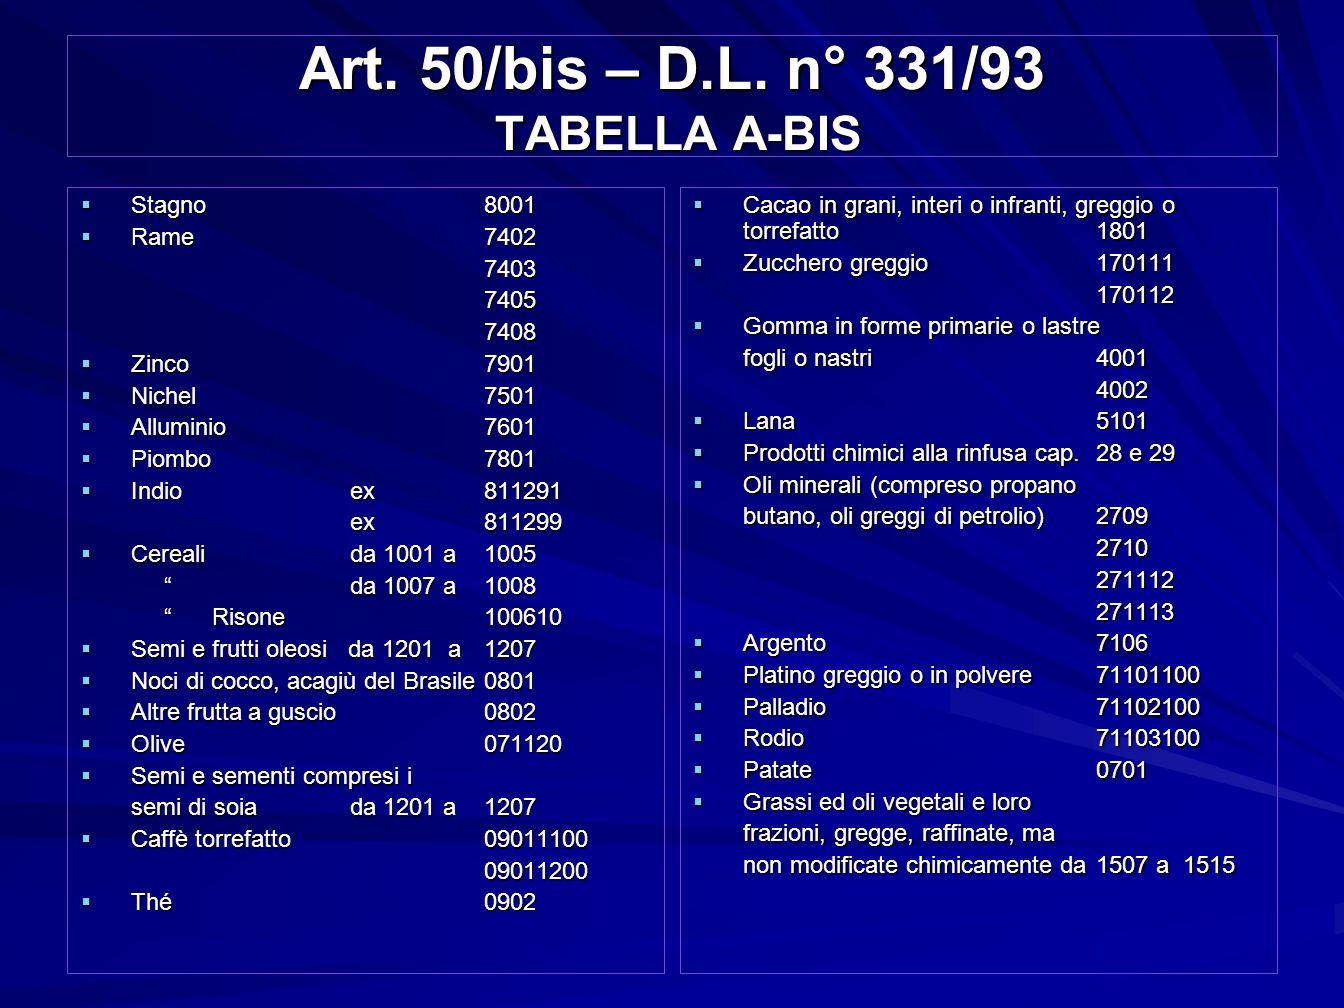 Art. 50/bis – D.L. n° 331/93 TABELLA A-BIS